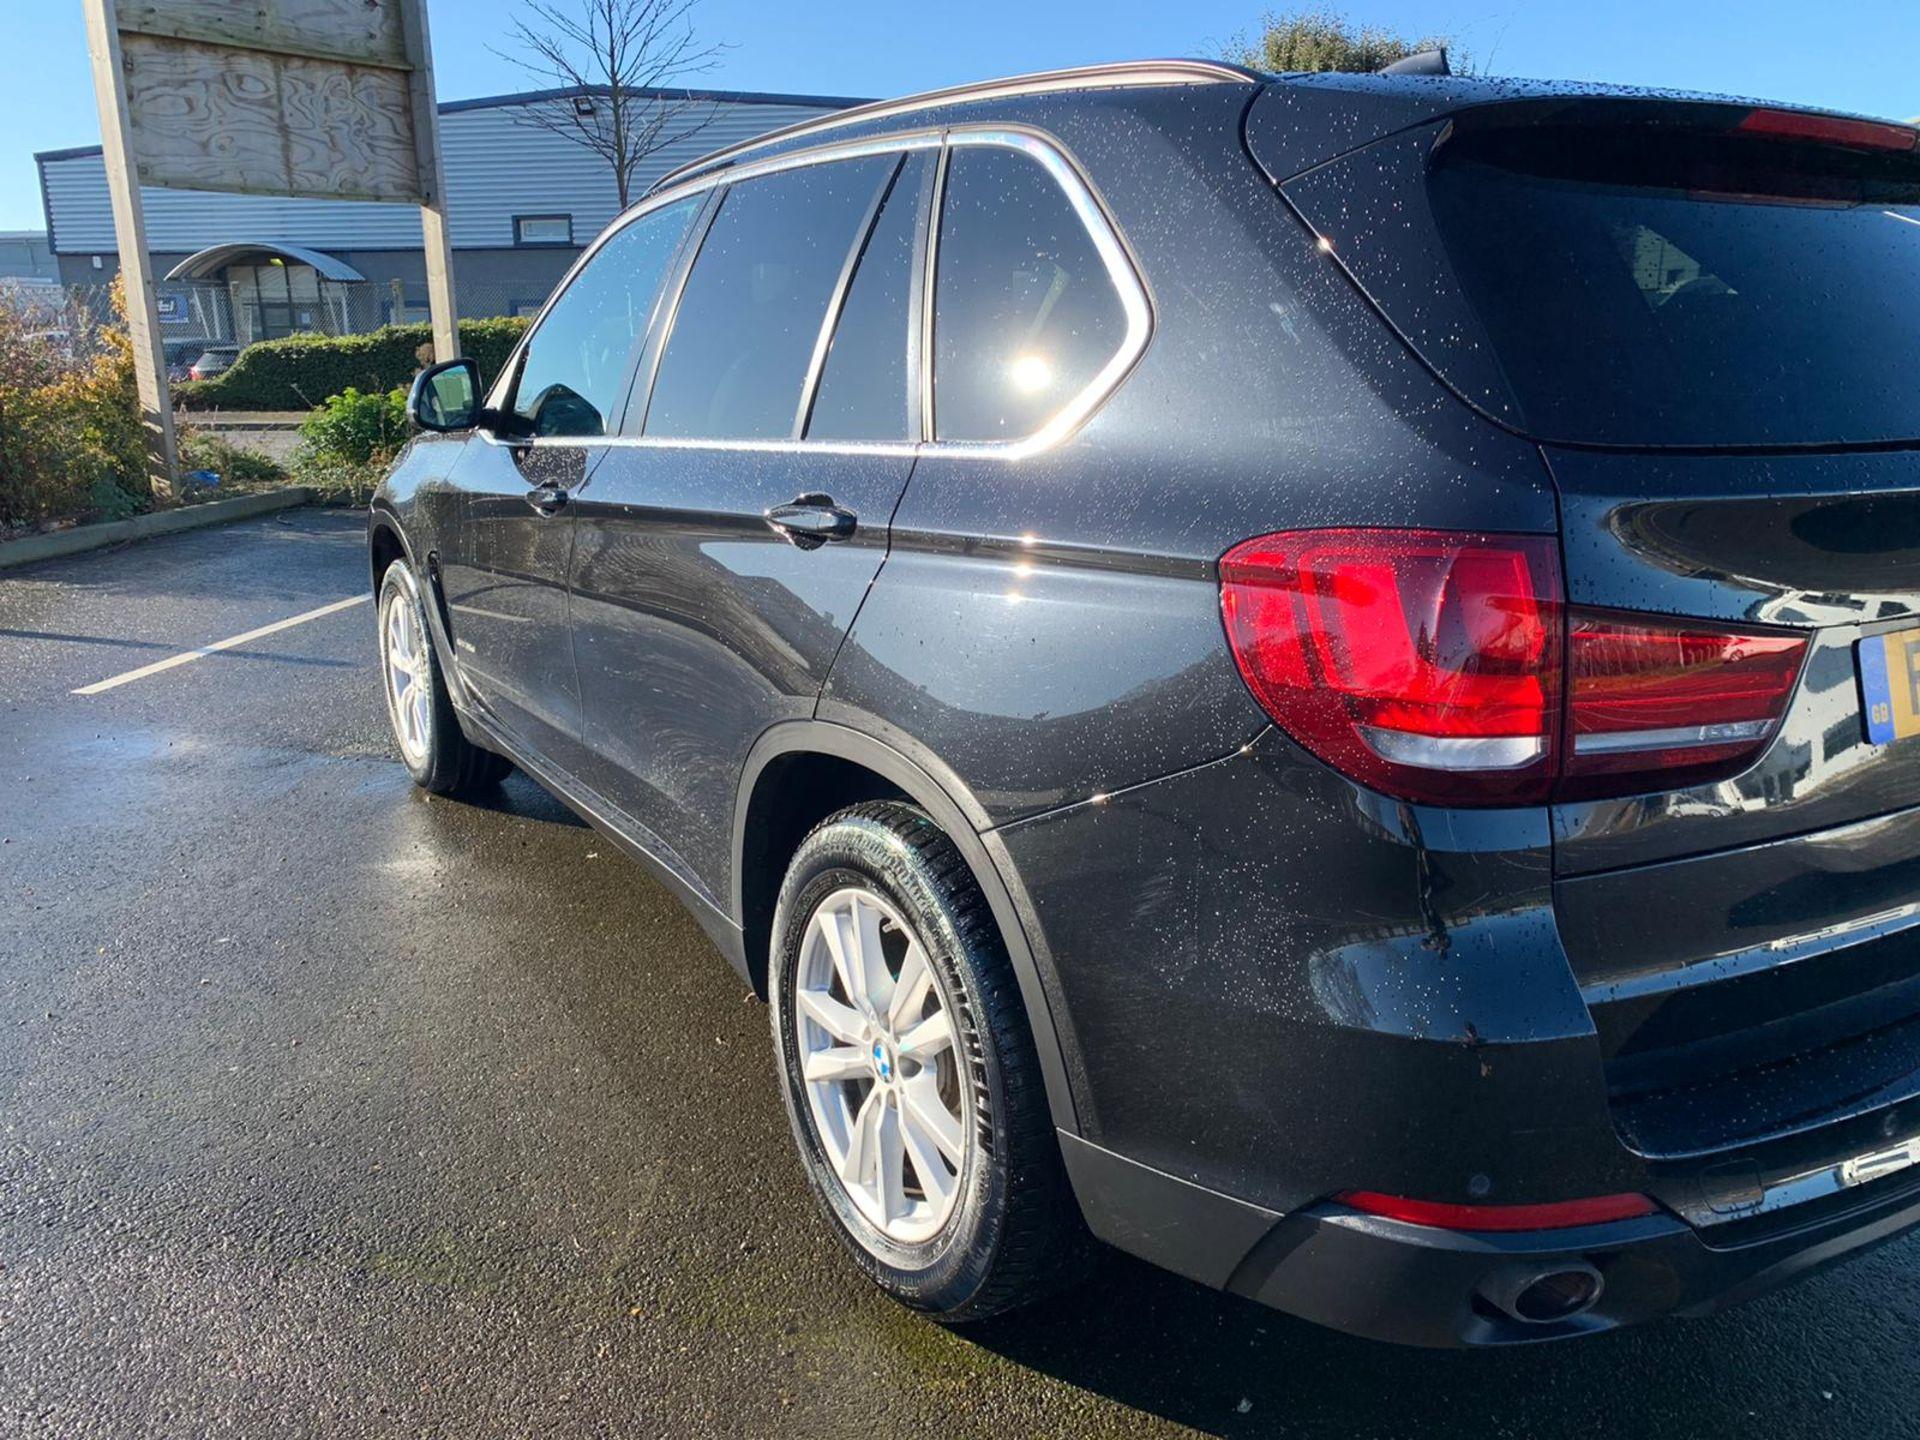 "(Reserve Met) BMW X5 2.0d S-DRIVE ""Special Equipment"" Auto- 7 Seater -16 Reg - Sat Nav- (New Shape) - Image 6 of 43"